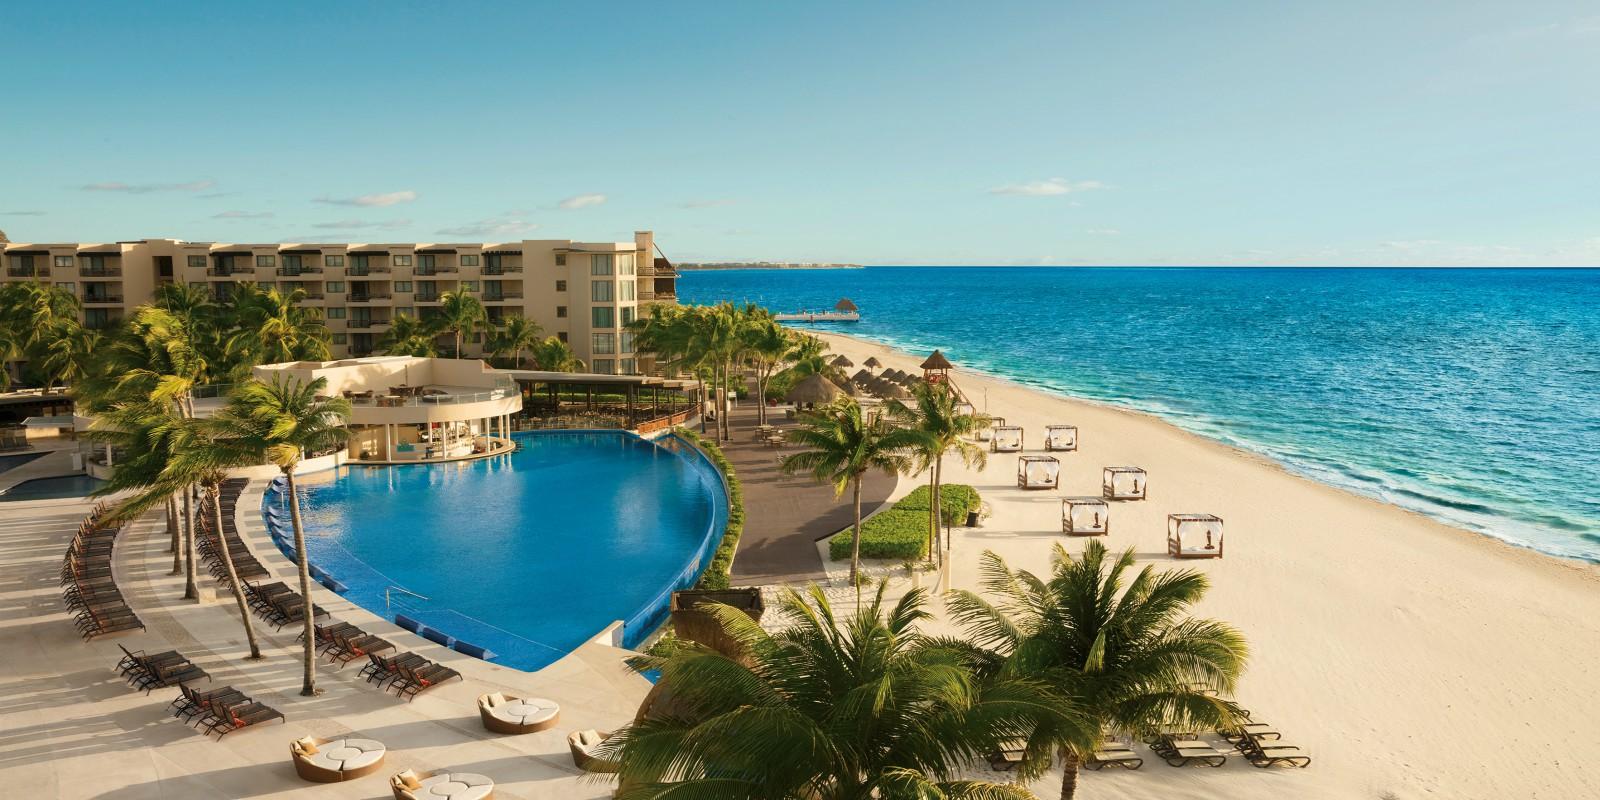 Travel blog: Explore Dreams Riviera Cancun Resort & Spa